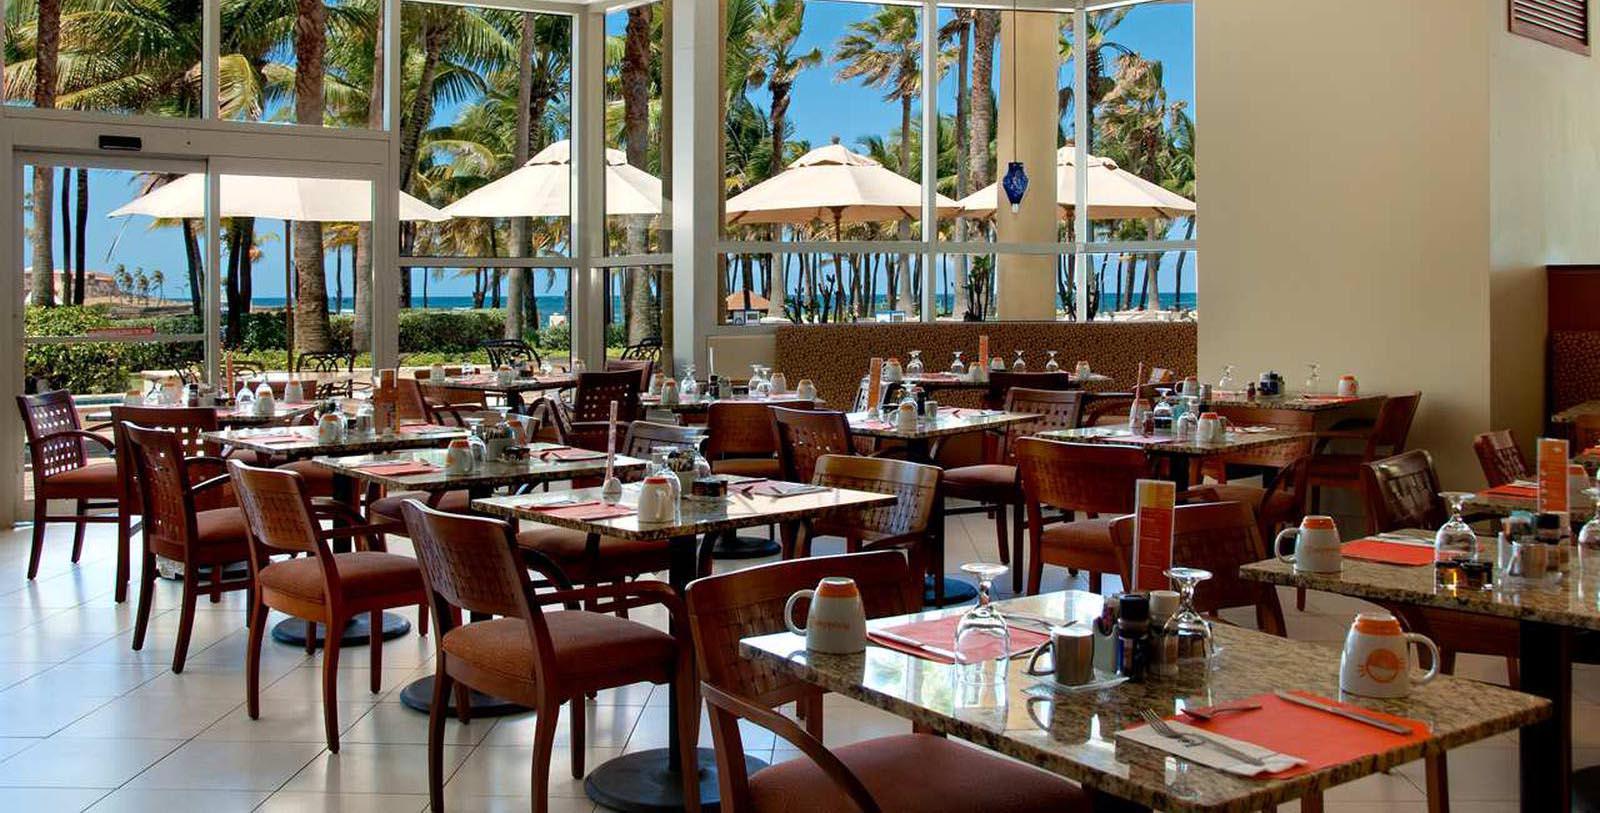 Image of Caribar bar area at Caribe Hilton, 1949, Member of Historic Hotels of America, in San Juan, Puerto Rico, Taste